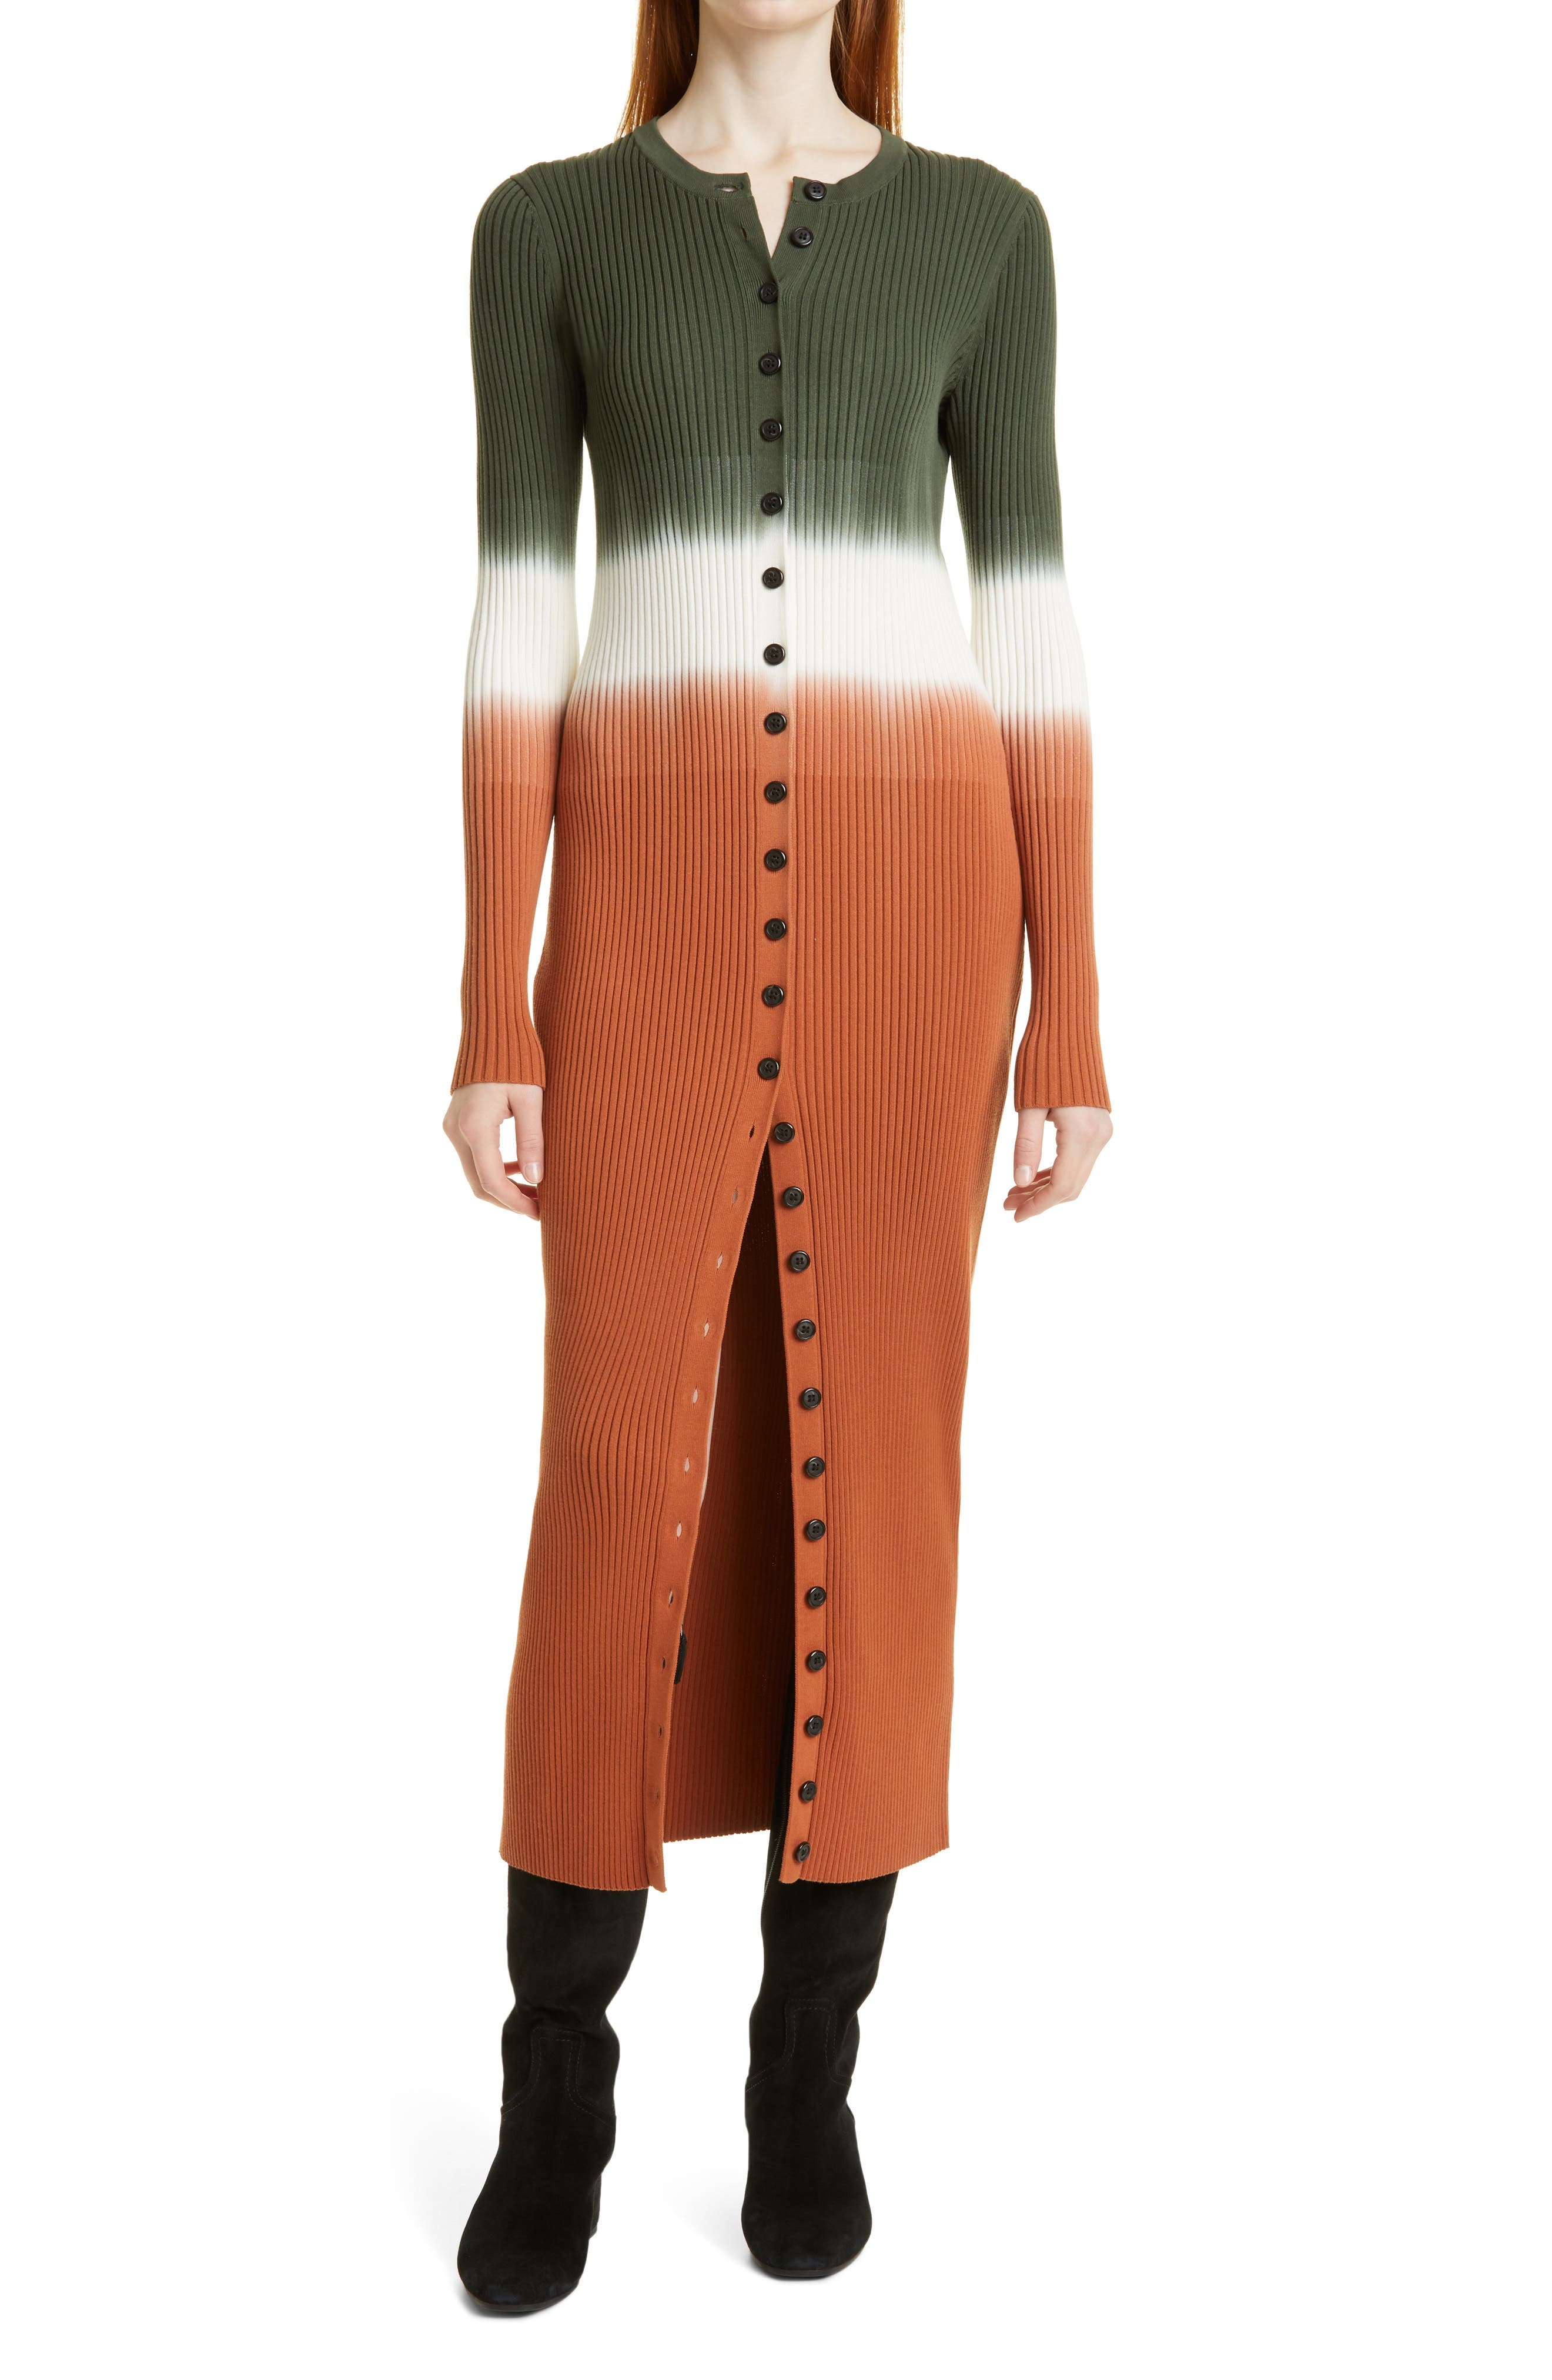 Tianna Ombre Colorblock Long Sleeve Cotton Blend Sweater Dress